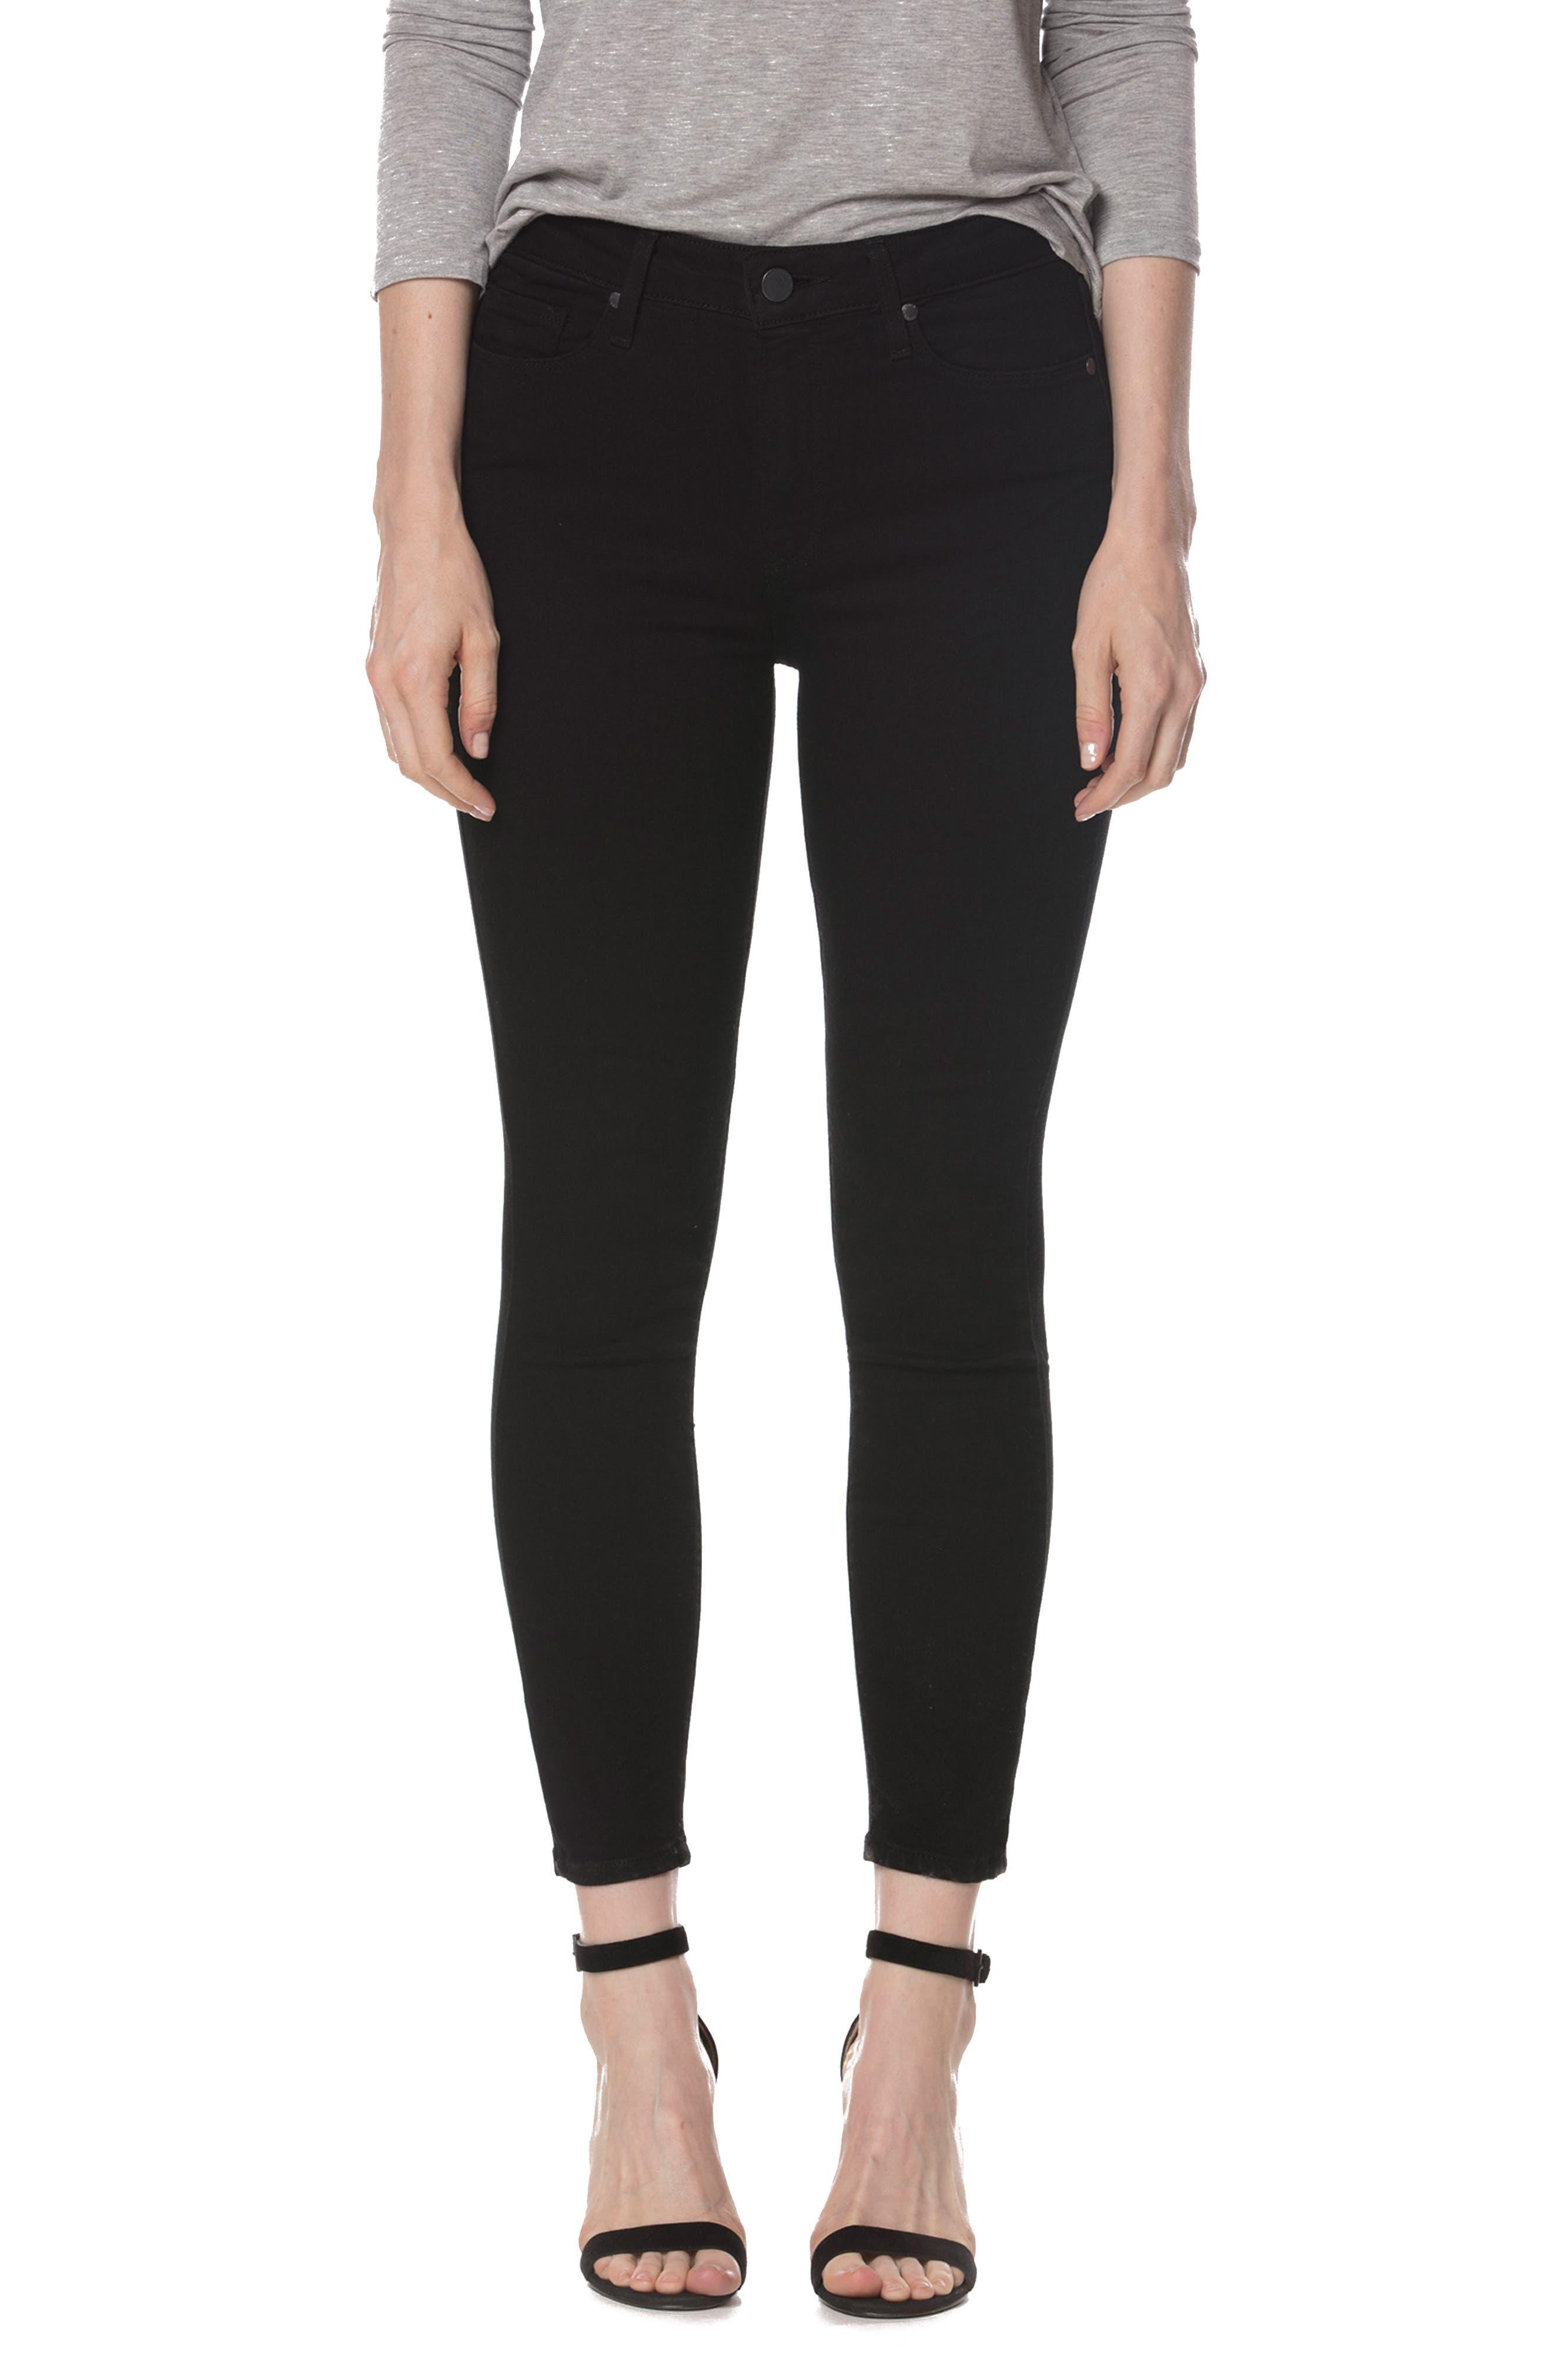 Hoxton High Waist Crop Skinny Jeans,                             Main thumbnail 1, color,                             Black Shadow